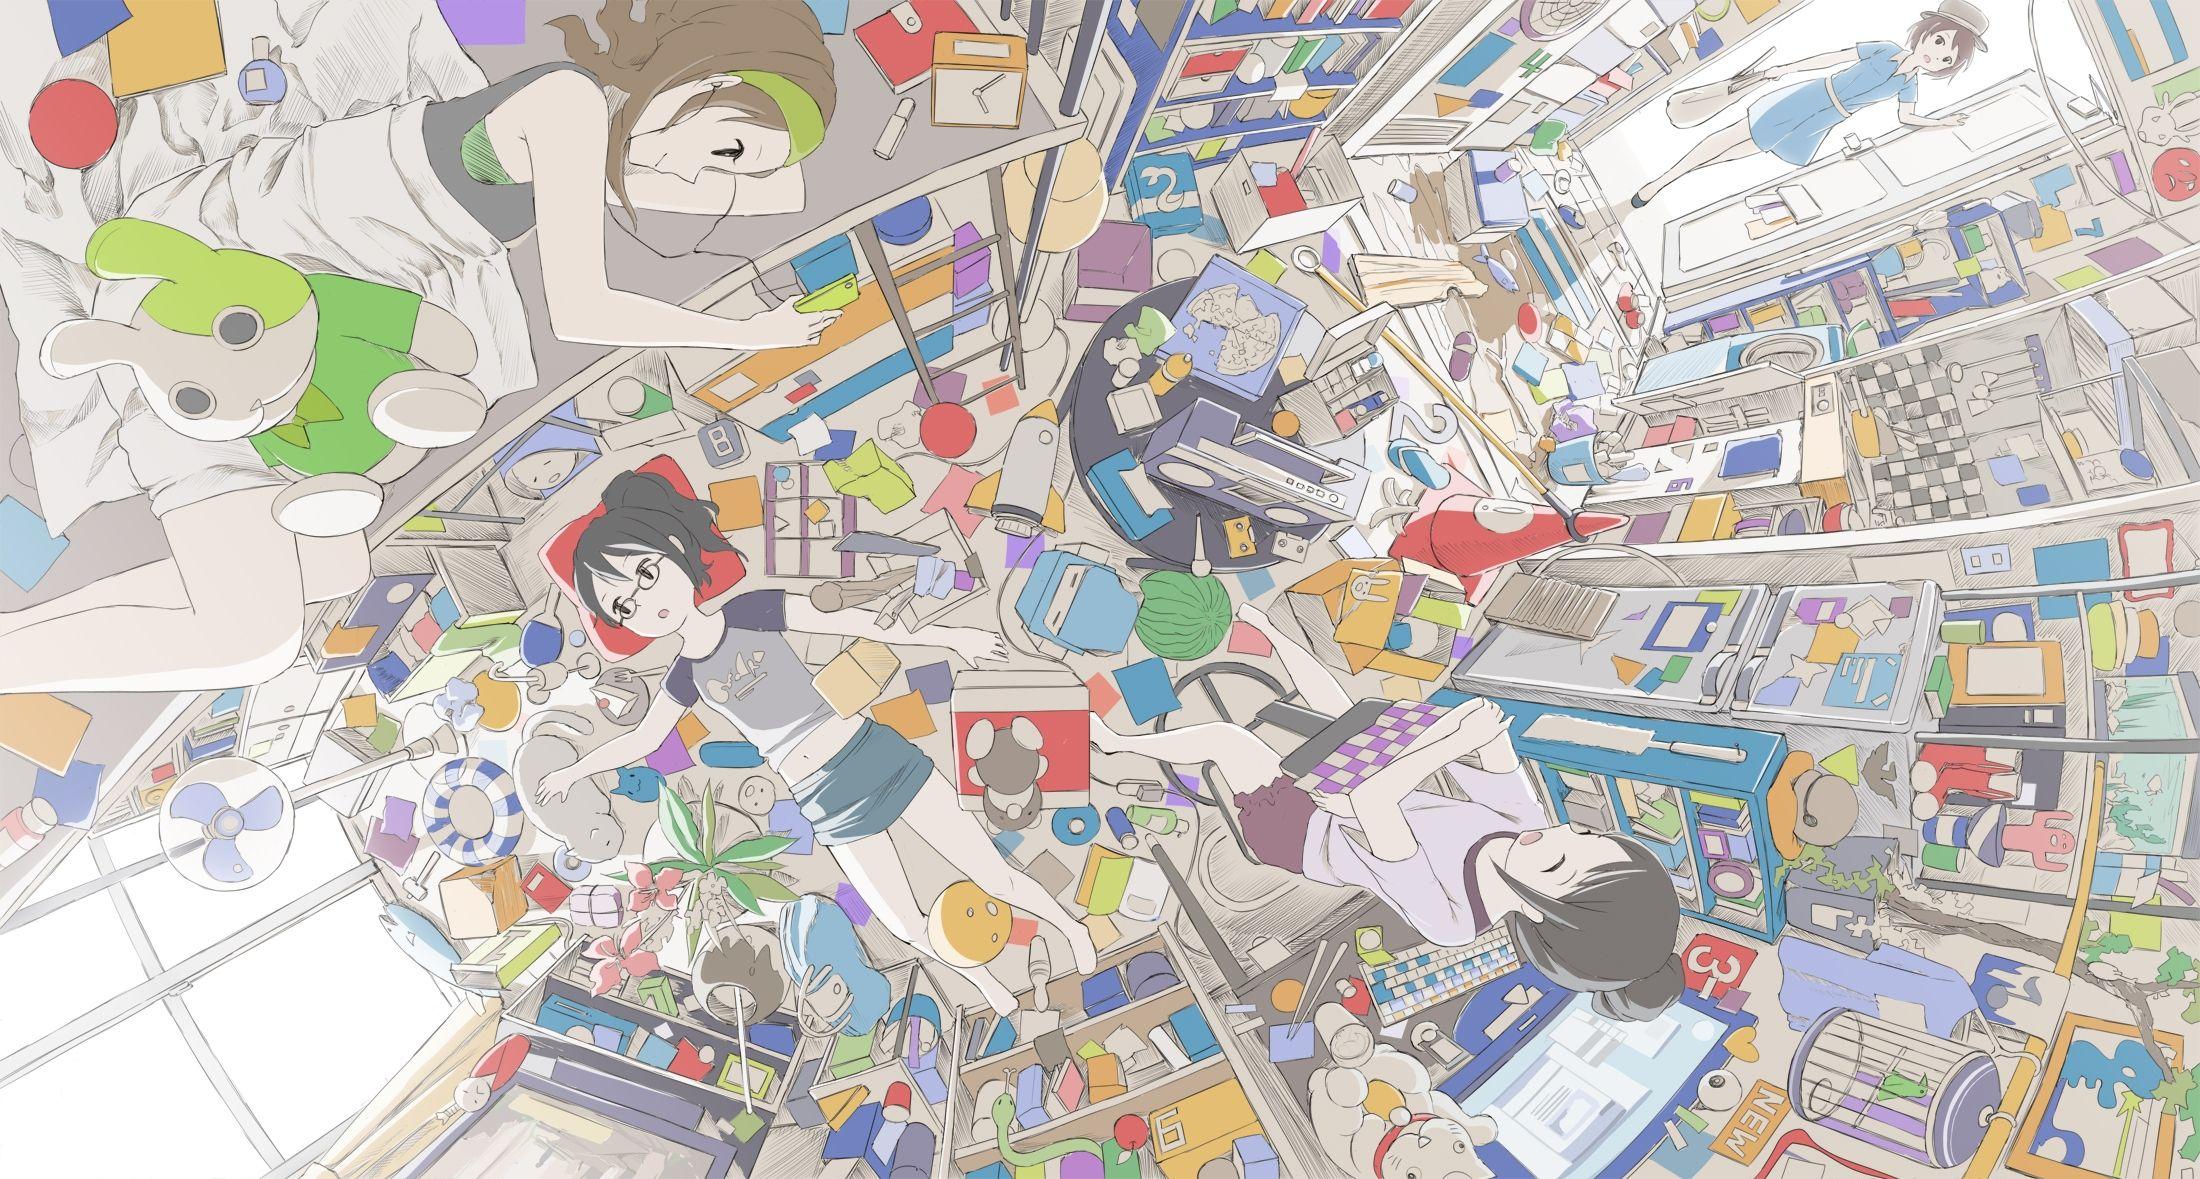 Anime Scenery Wallpapers Anime Scenery Wallpaper Scenery Wallpaper Anime Scenery 13 ultrawide anime wallpaper